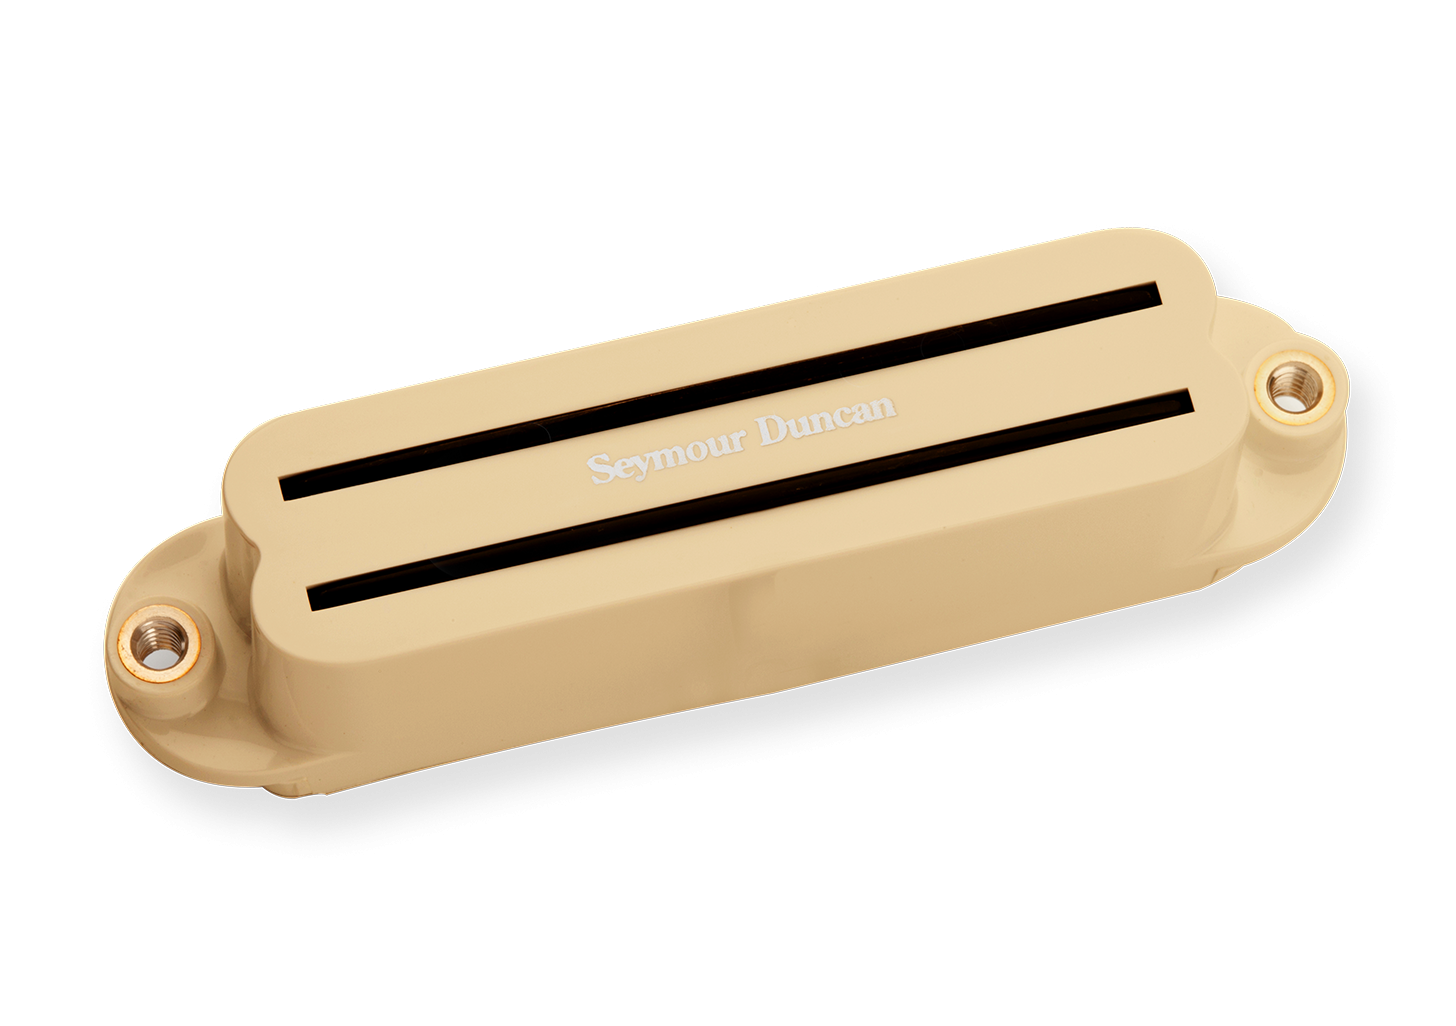 Seymour Duncan Hot Rails Strat SHR-1N - Neck Cream